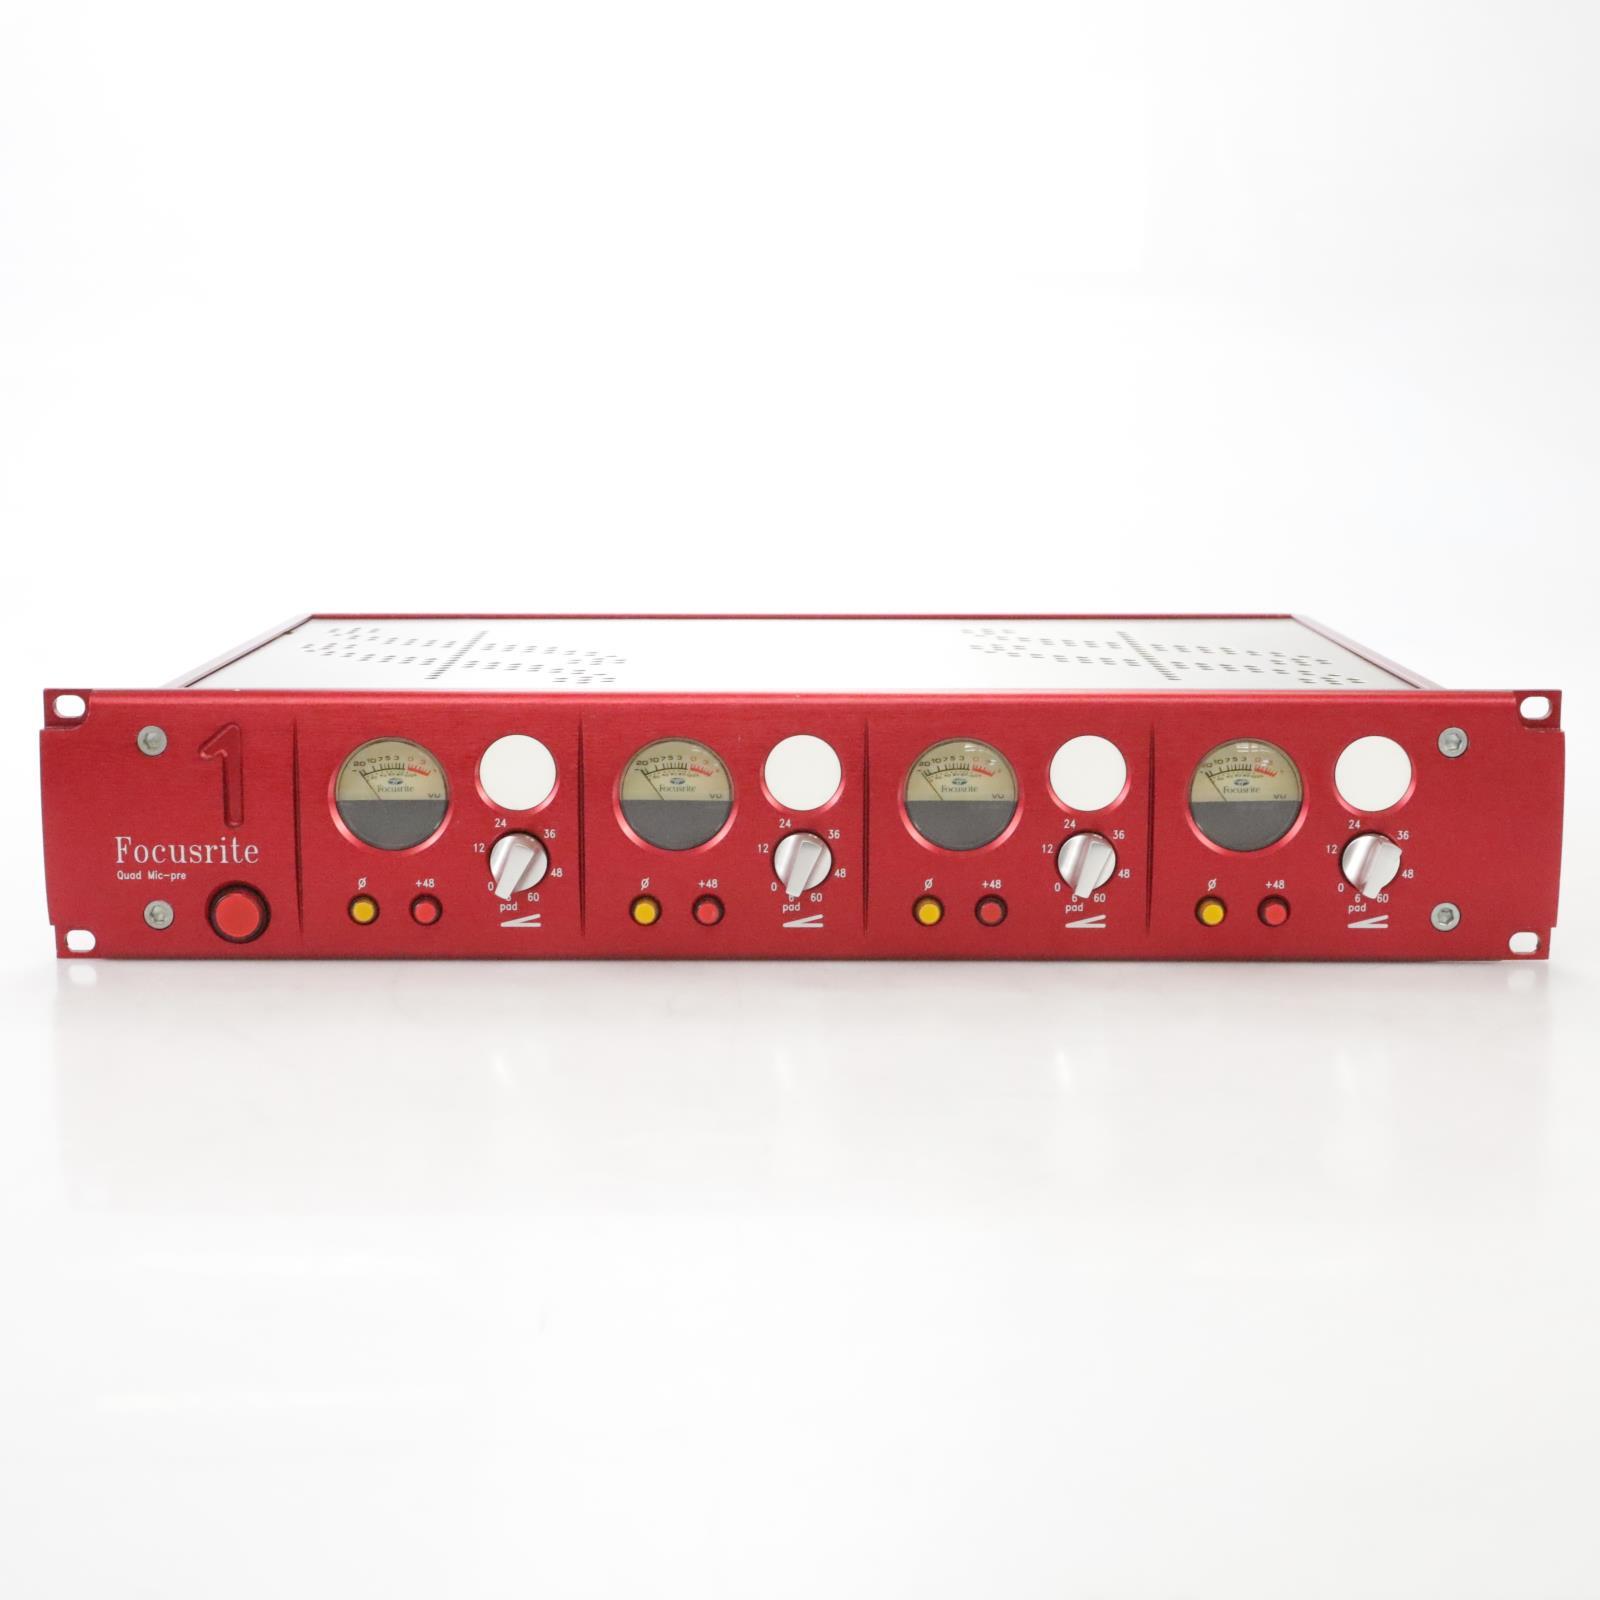 Focusrite Red 1 Quad-Pre 4-Channel Microphone Mic Preamp #44395